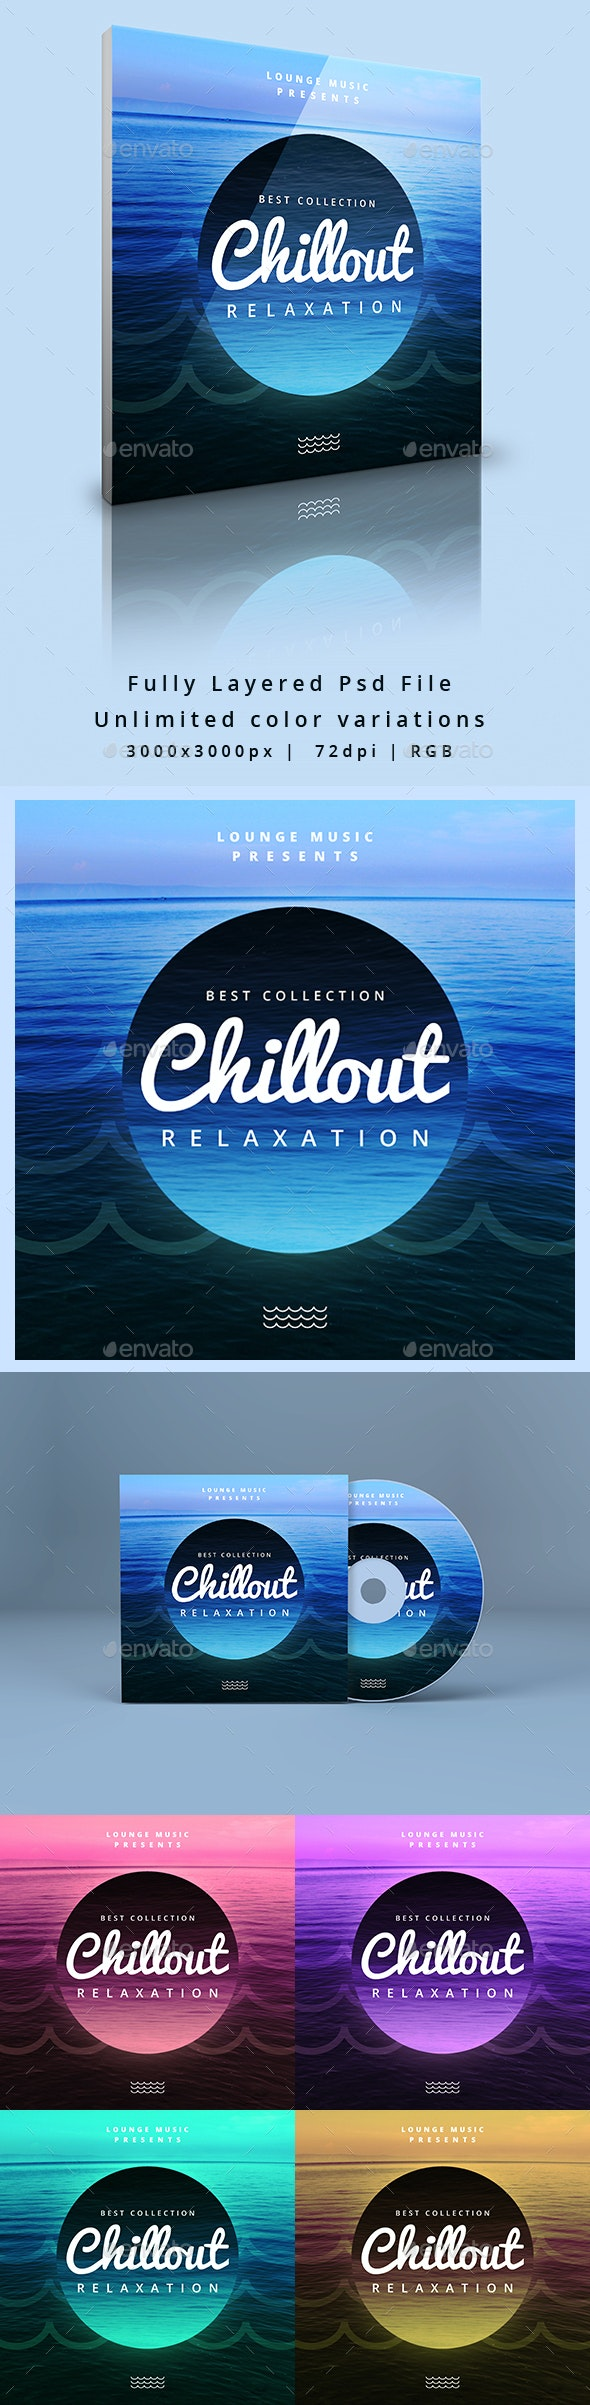 Chillout - Music Cover Album Artwork Web Template - Miscellaneous Social Media